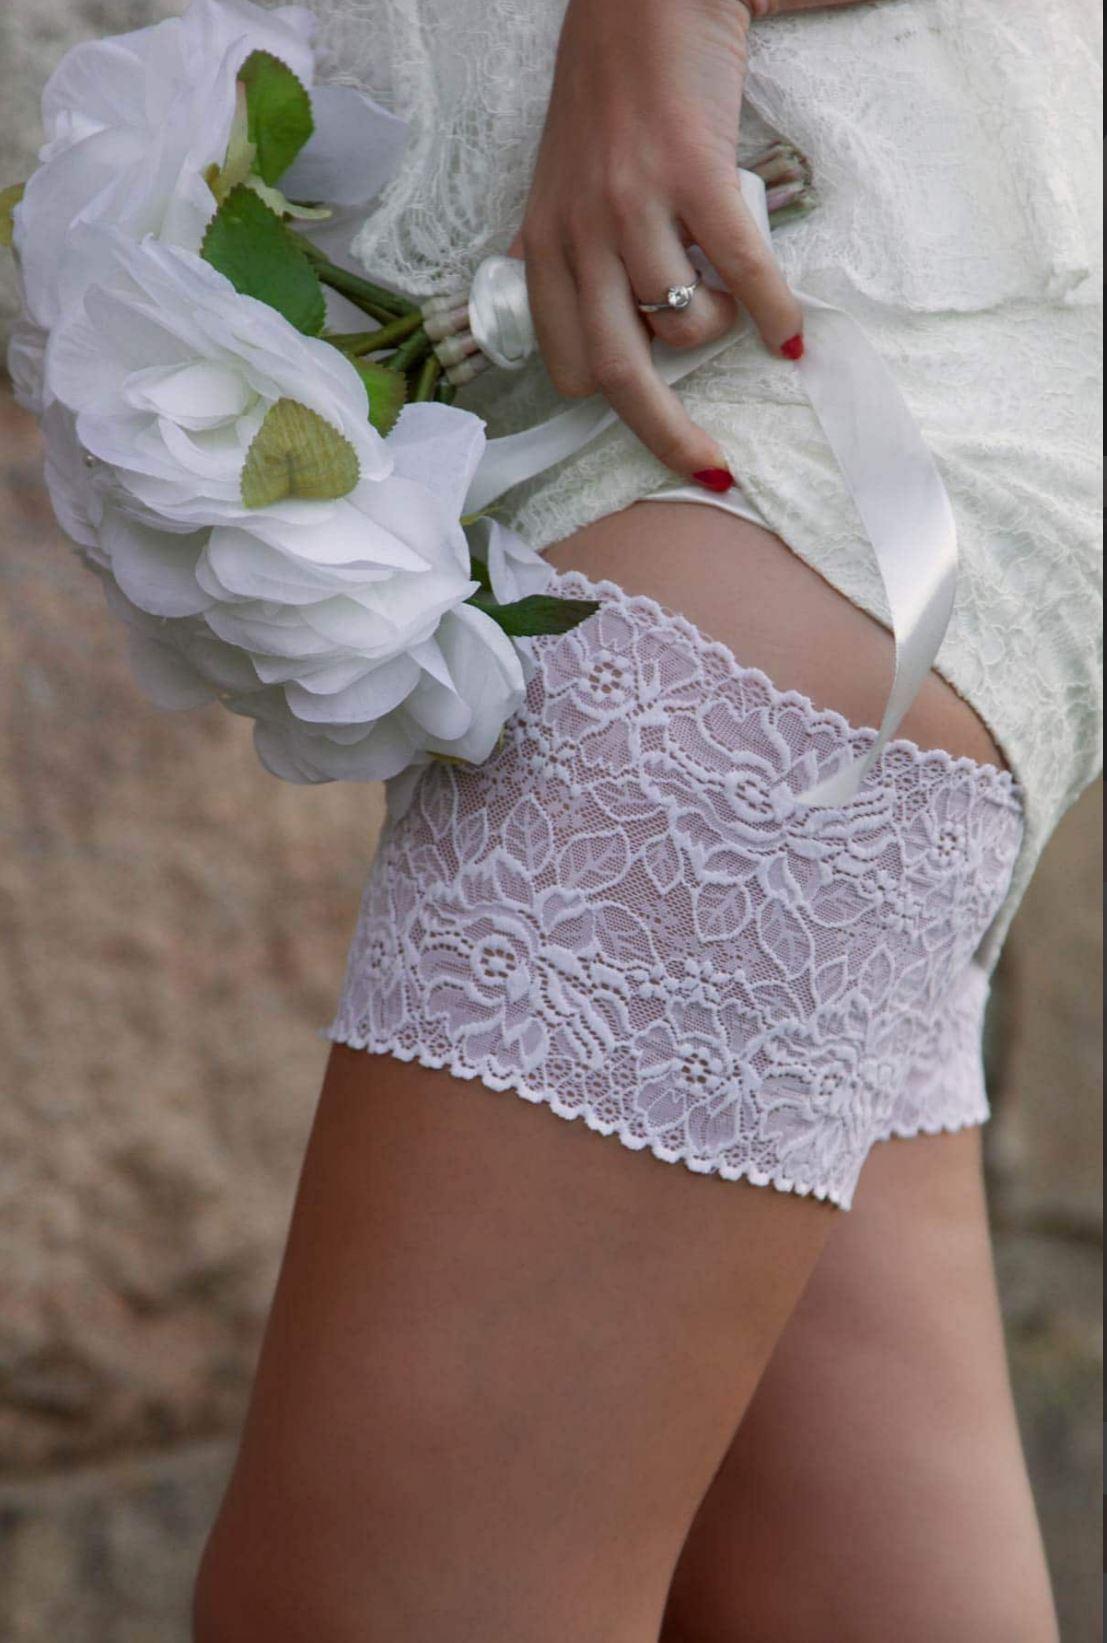 white-bridal-thigh-bands.jpg